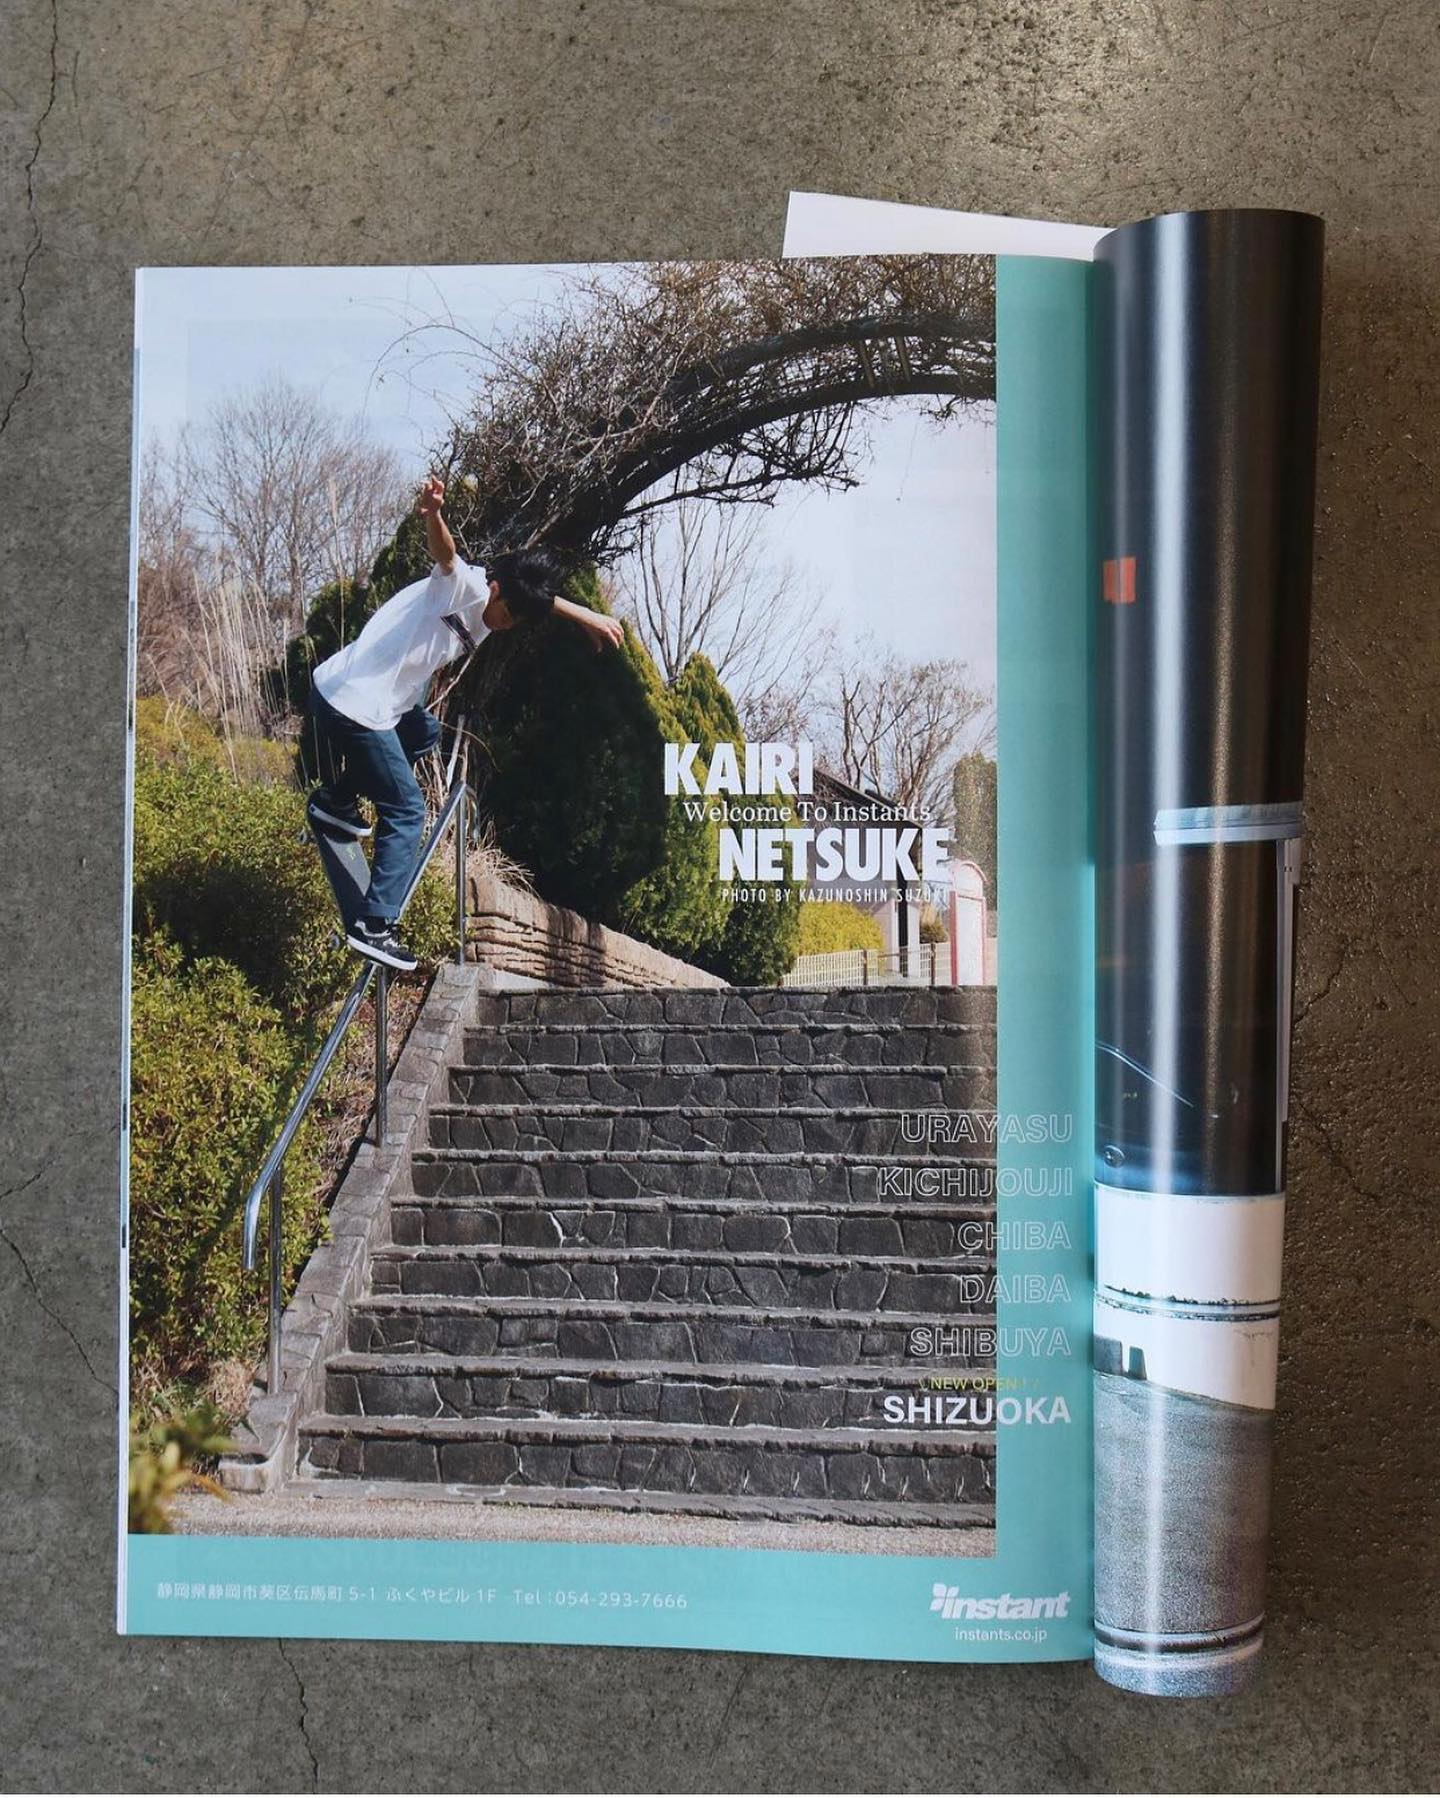 BOARDKILL New ISSUE #37 #boardkill#giveaway instantskteshop#instant_shizuoka